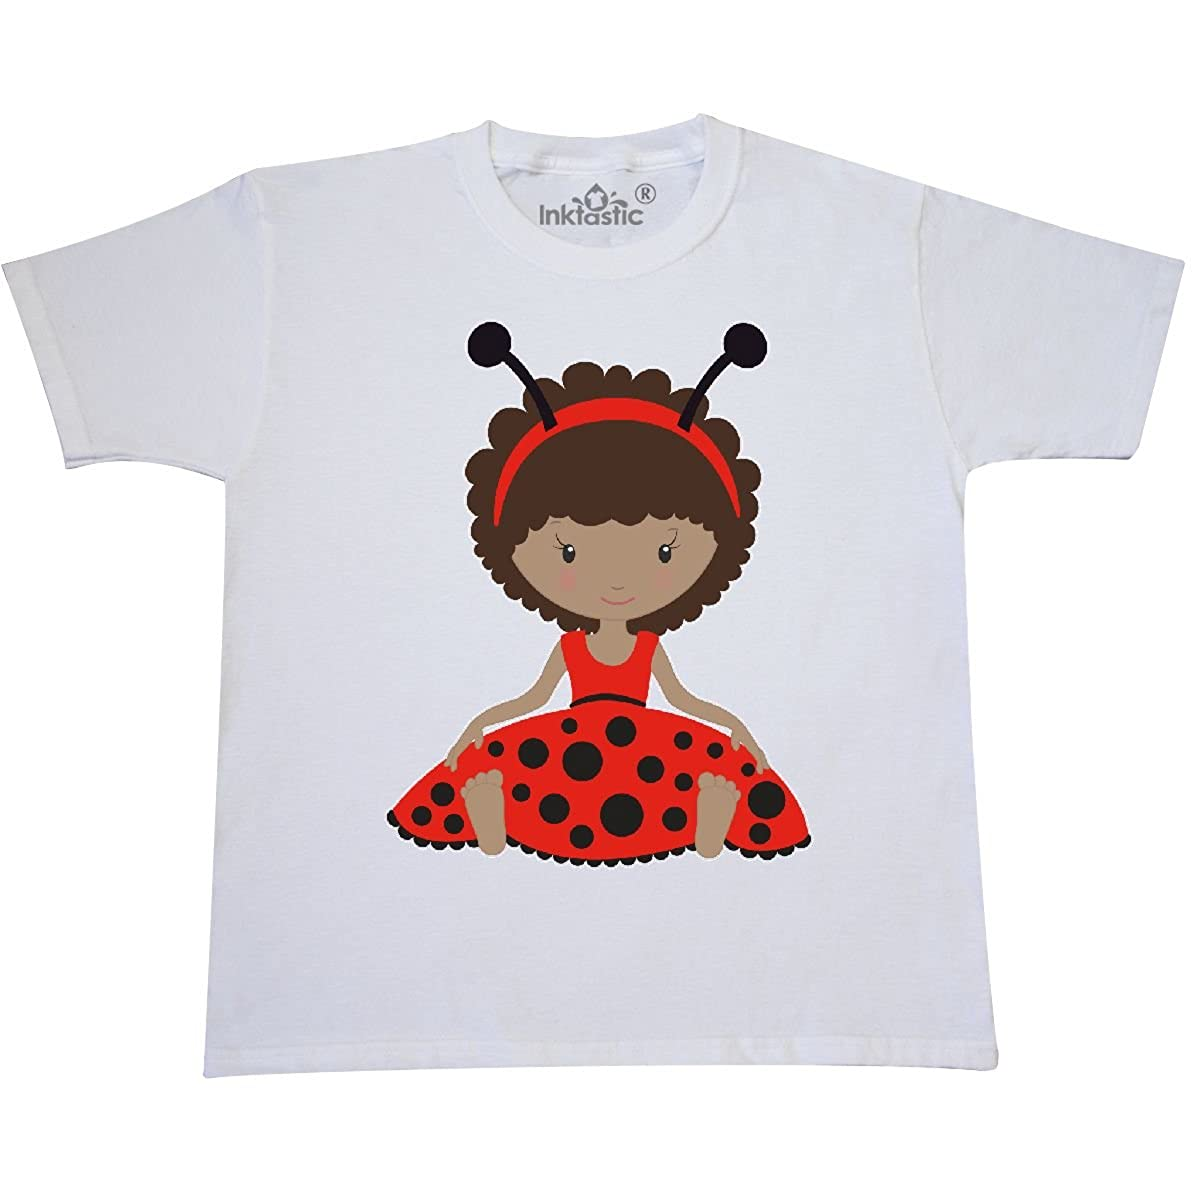 Amazon.com: inktastic Big catarina niña étnico de las niñas ...